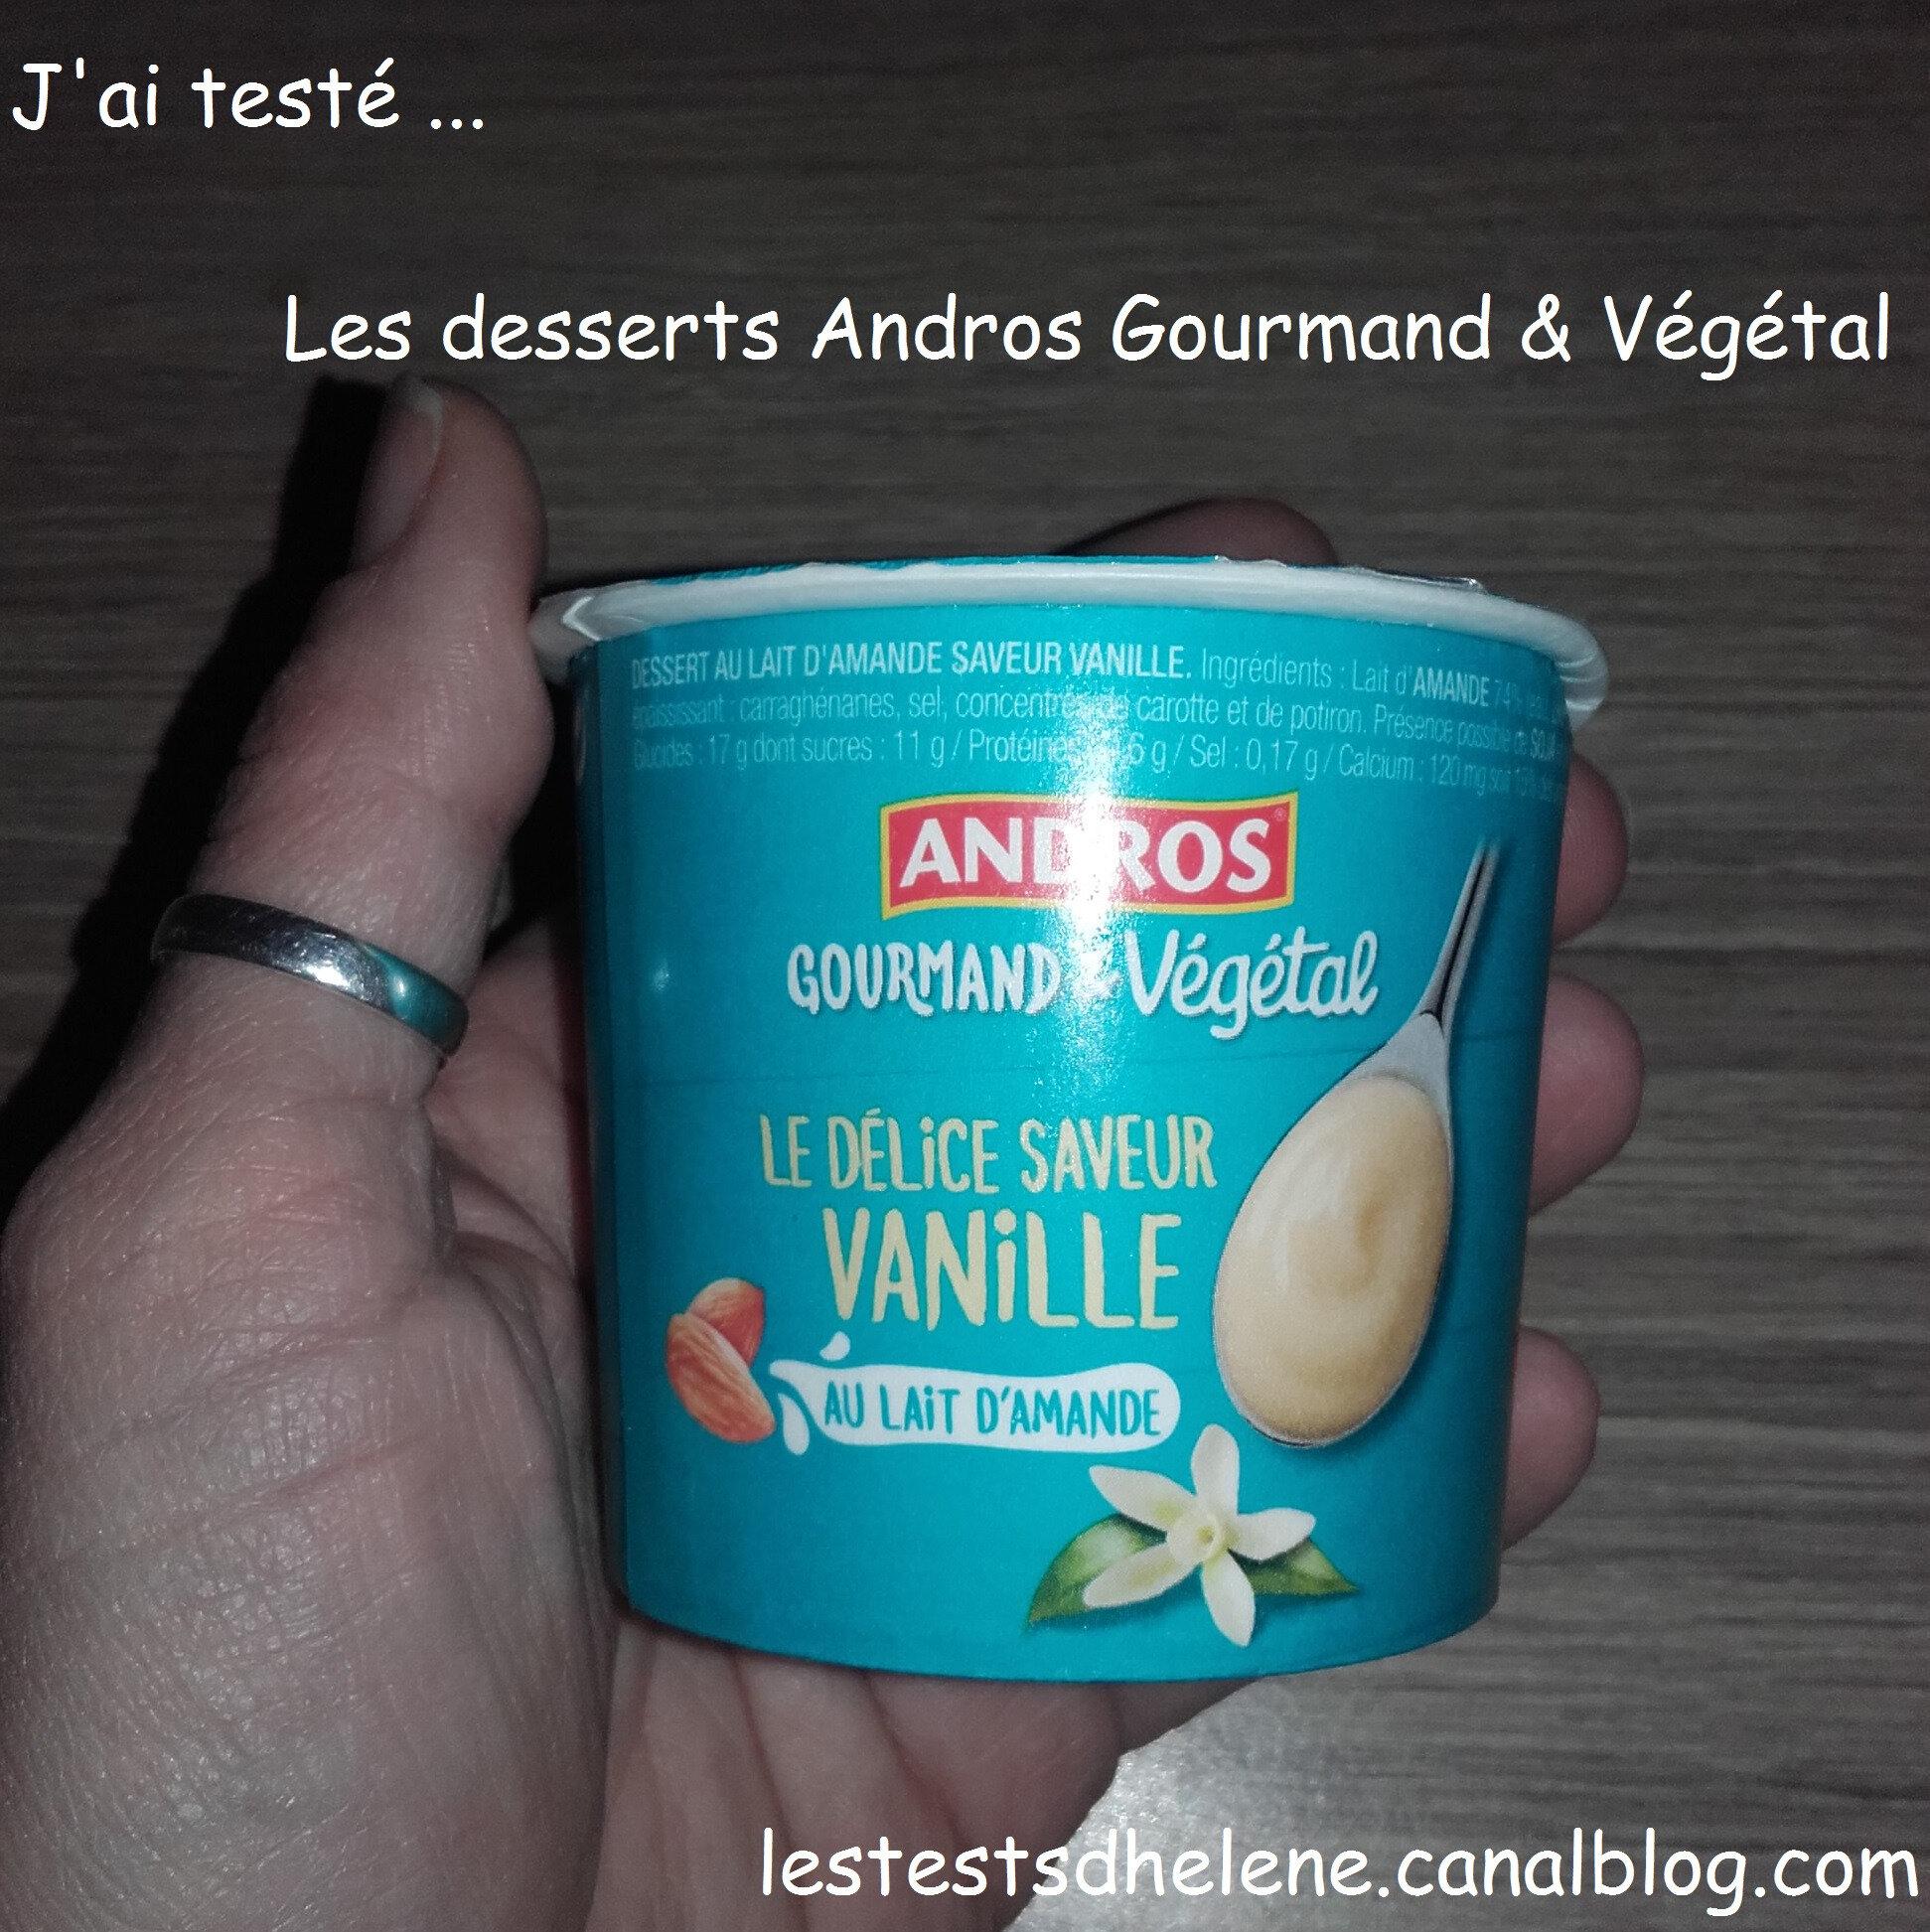 J'ai testé ... les desserts Andros Gourmand & Végétal